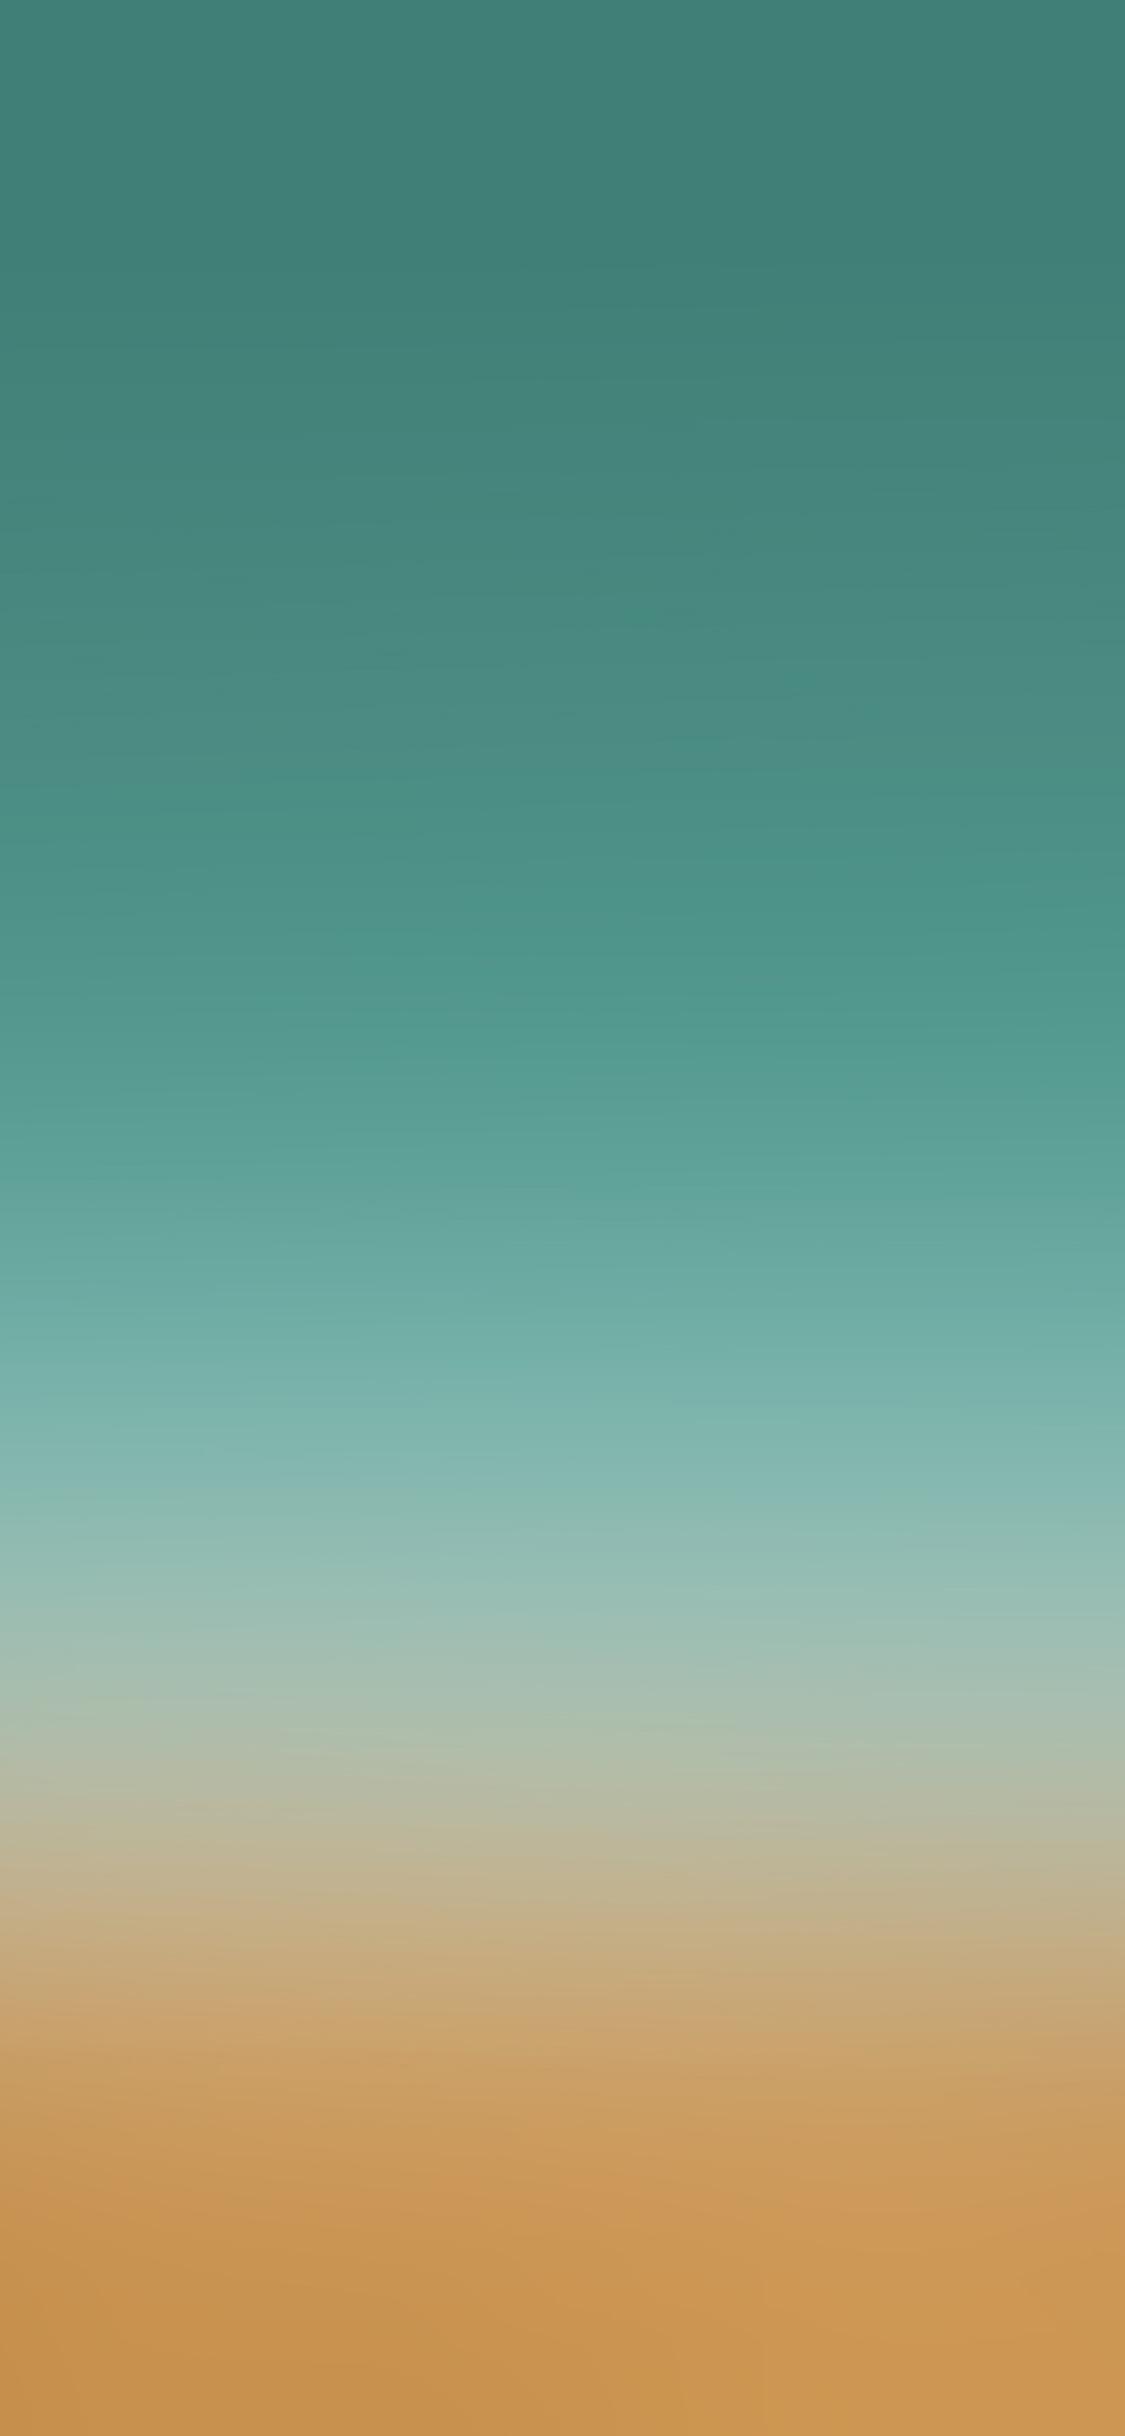 iPhoneXpapers.com-Apple-iPhone-wallpaper-sb82-orange-mountain-blur